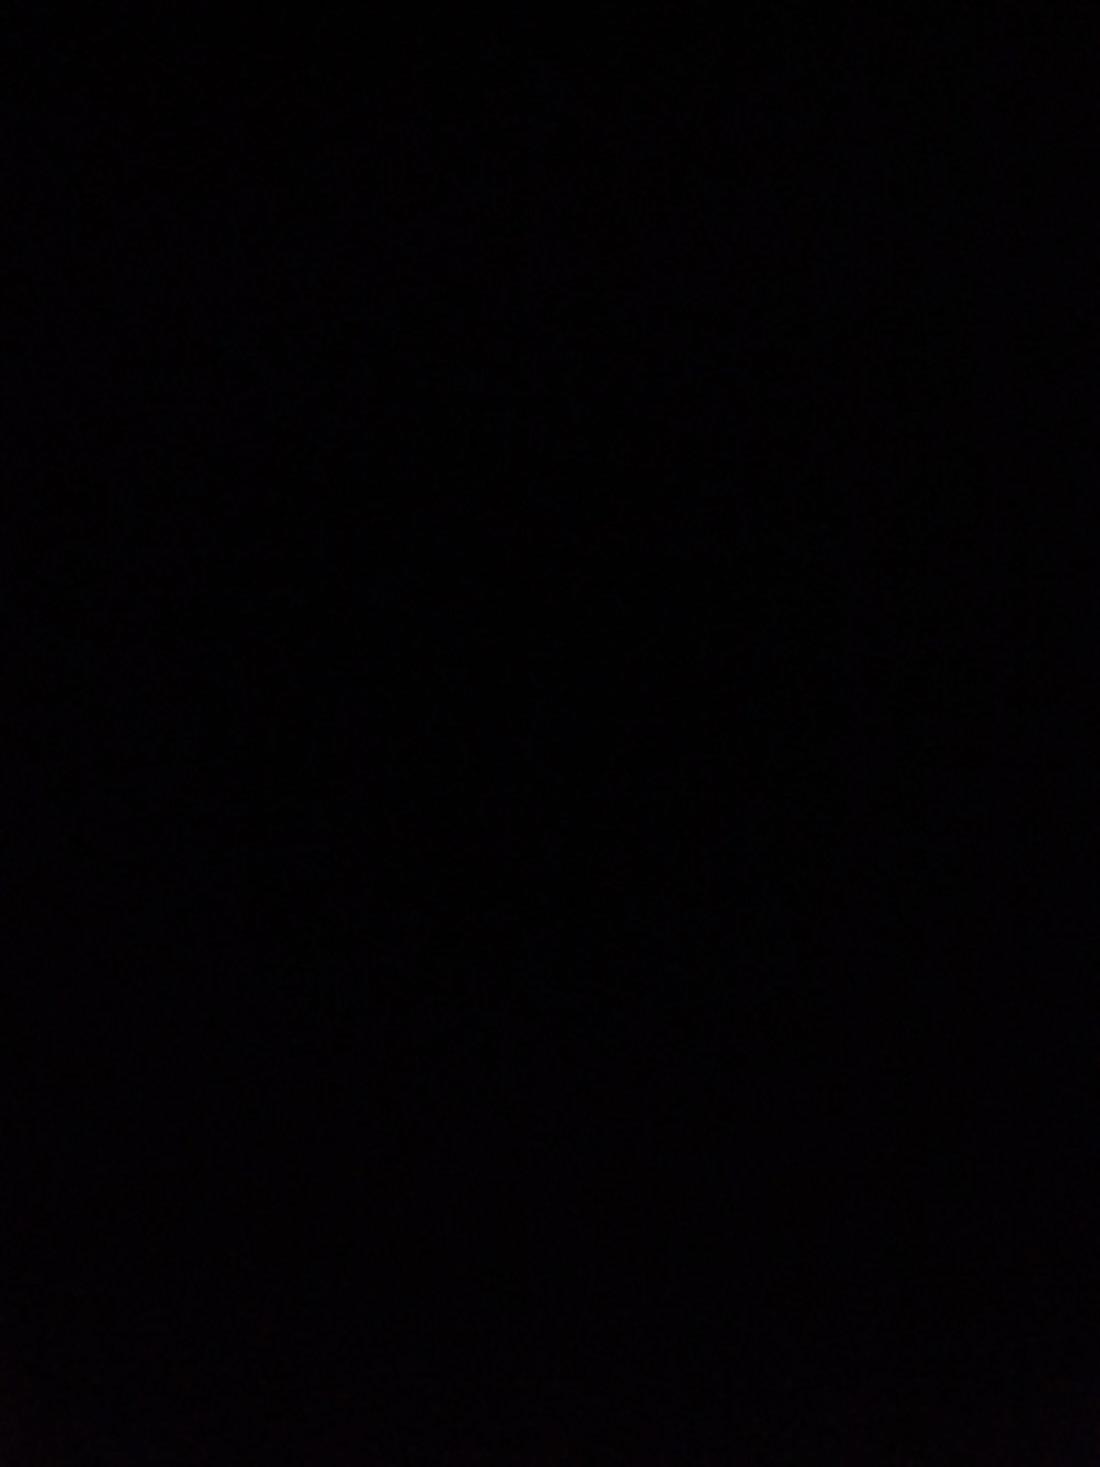 1200px-Black_colour.jpg